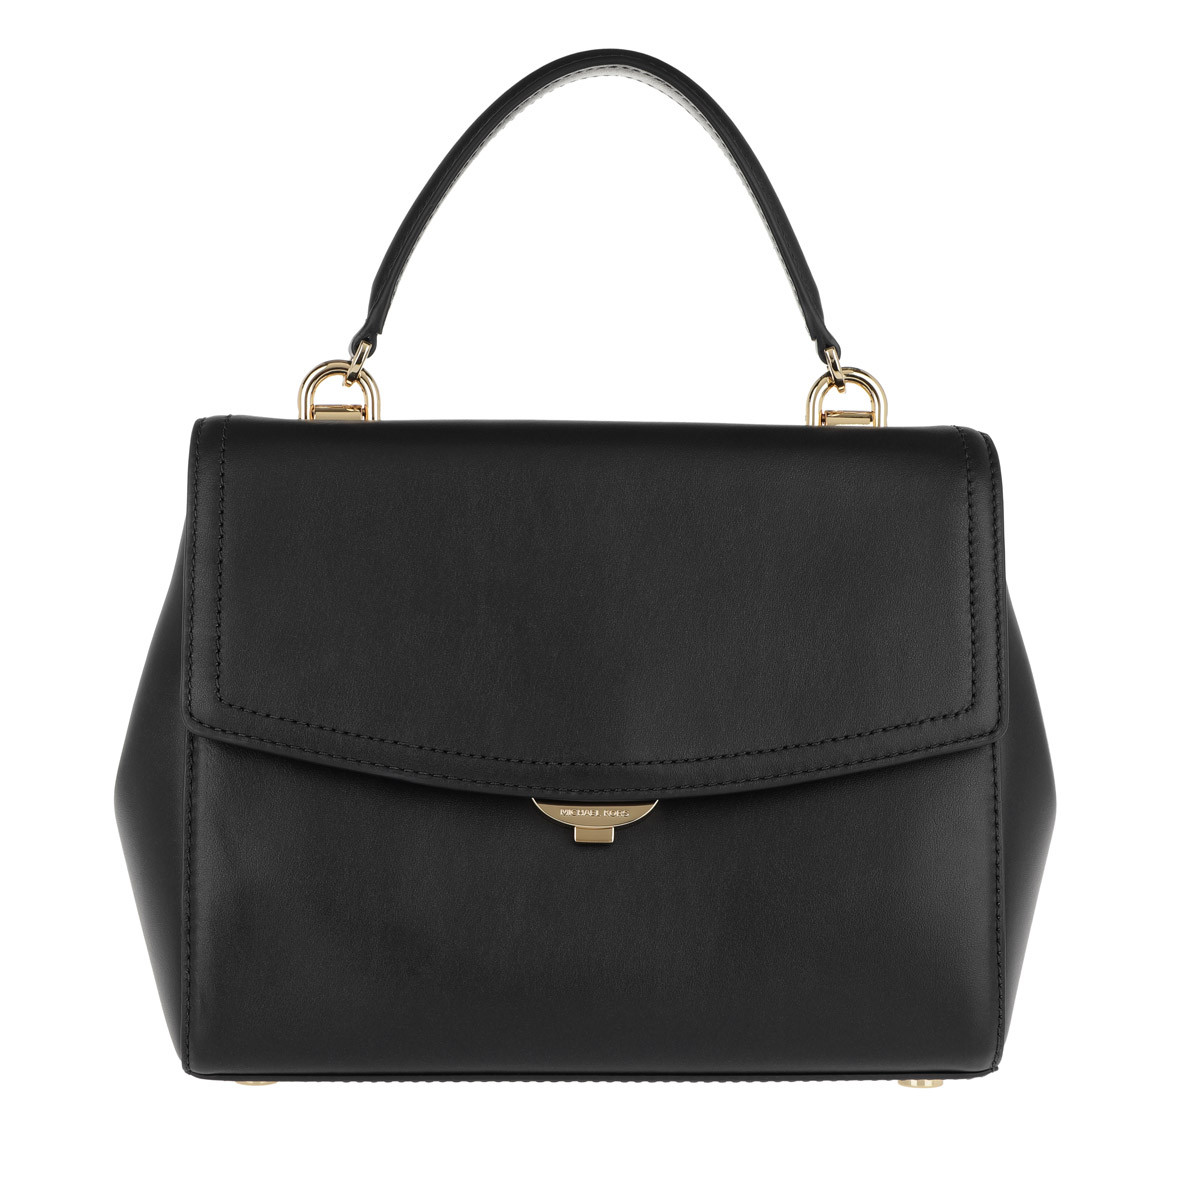 Michael Kors Satchel Bag - Ava MD TH Satchel Bag Black - in schwarz - für Damen